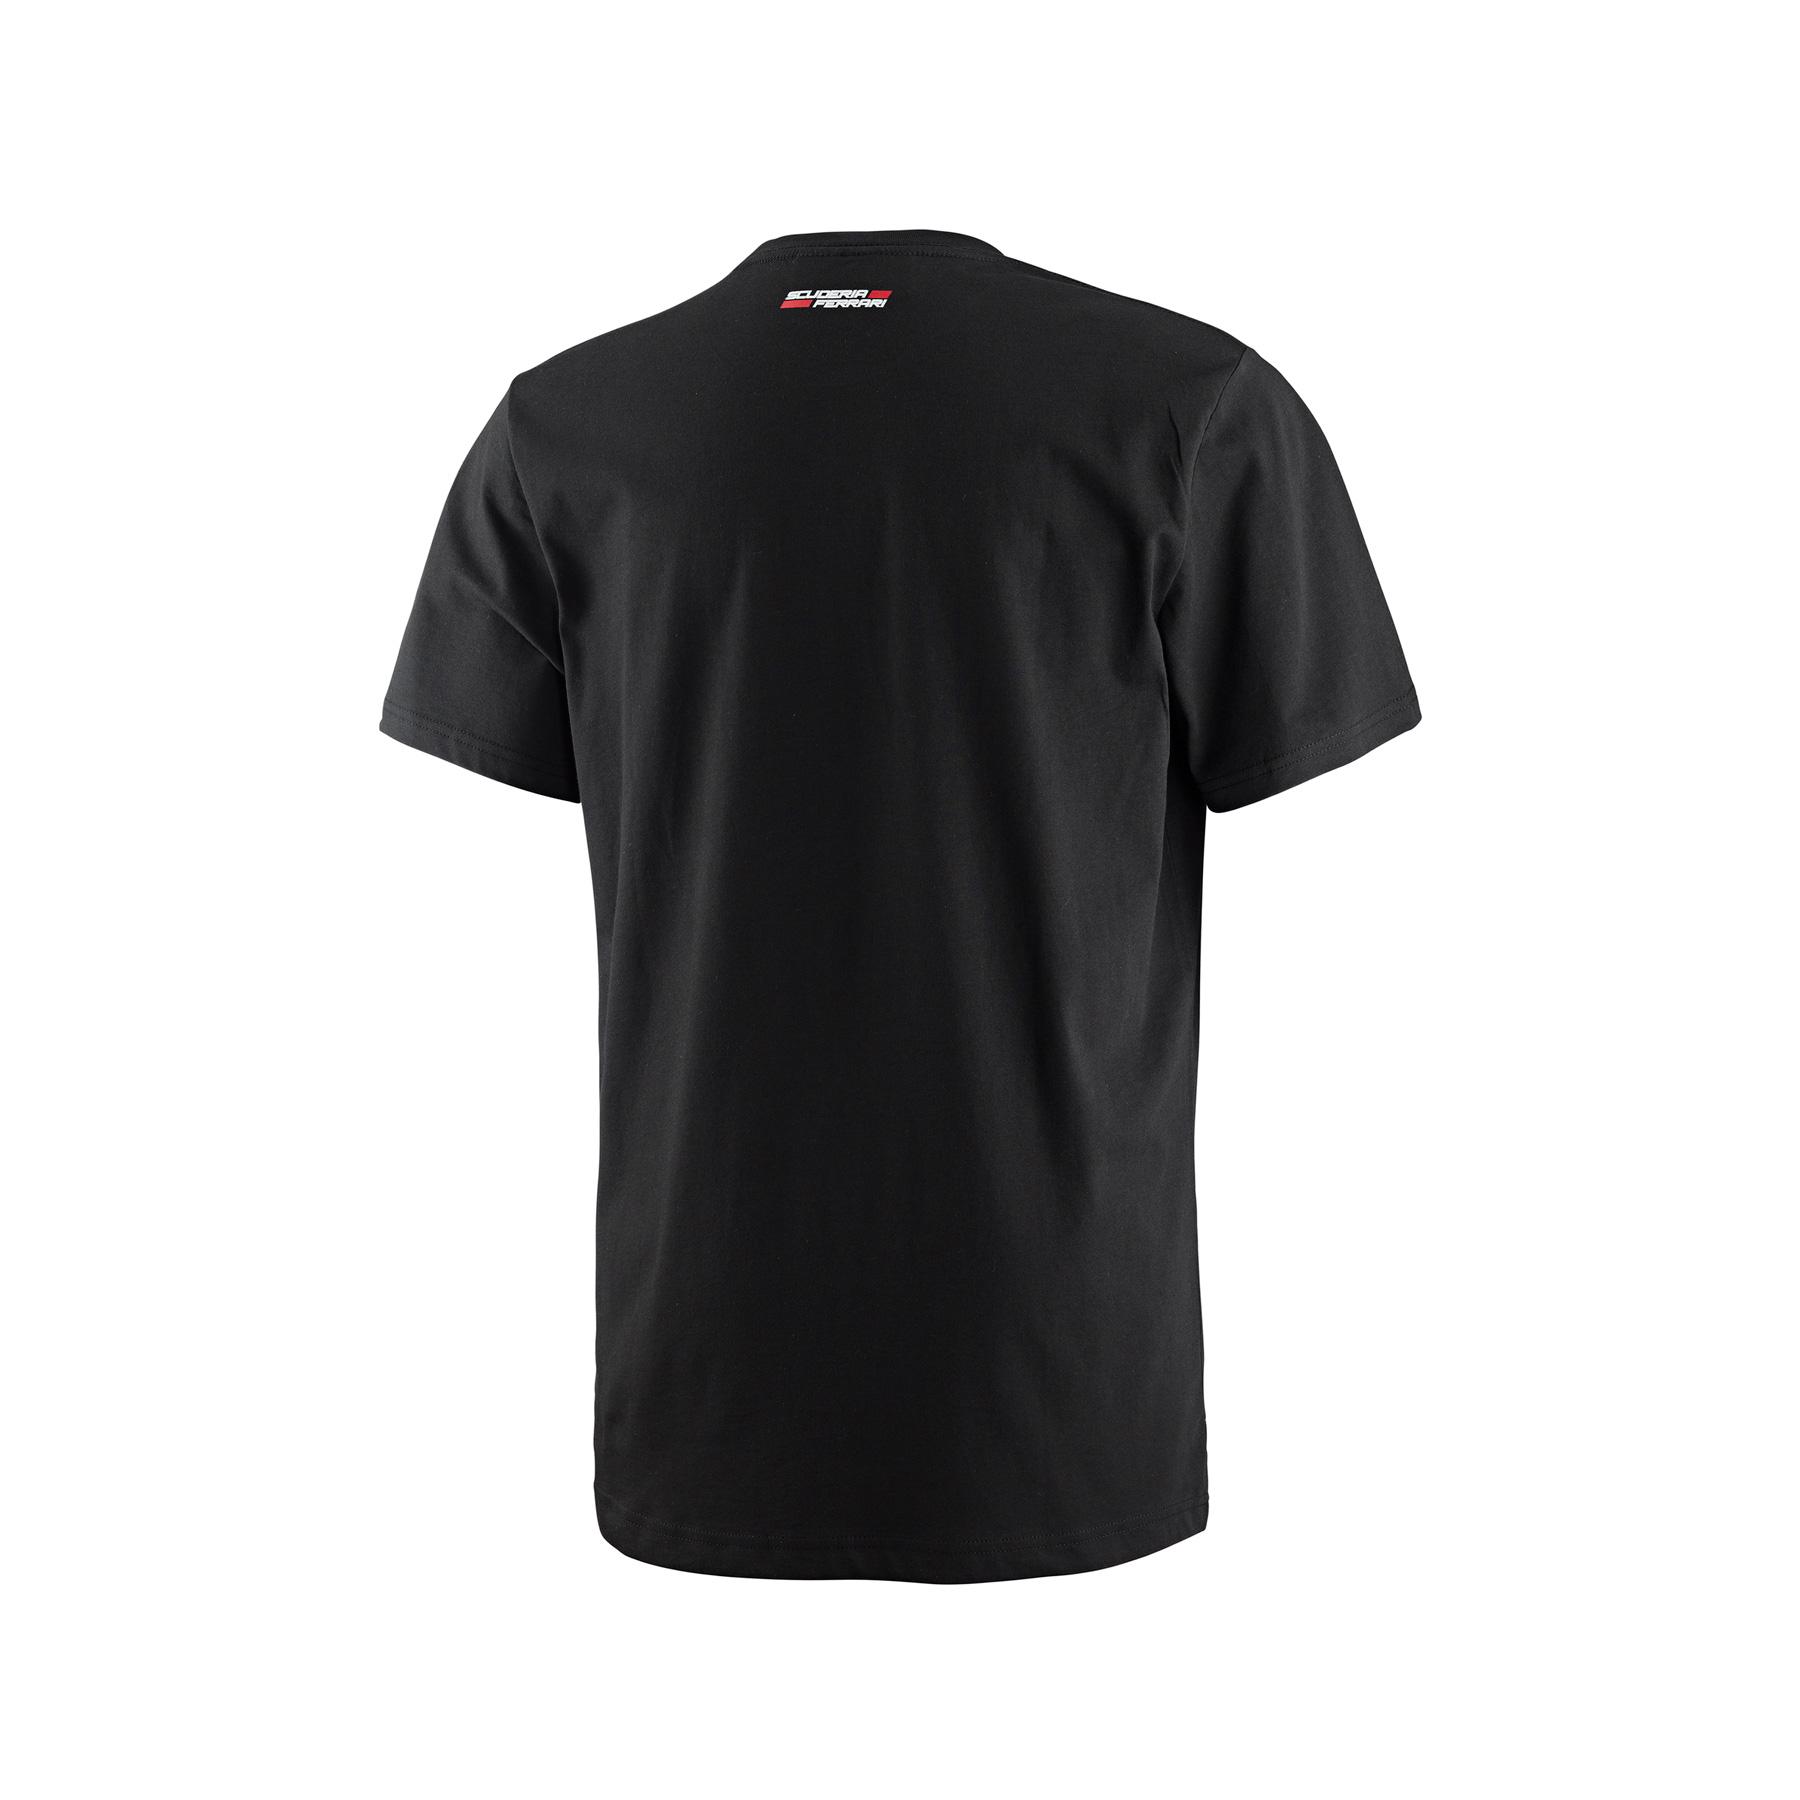 itm premium s ferrari o shield new mens sf cotton graphic big shirt tee men puma t jersey